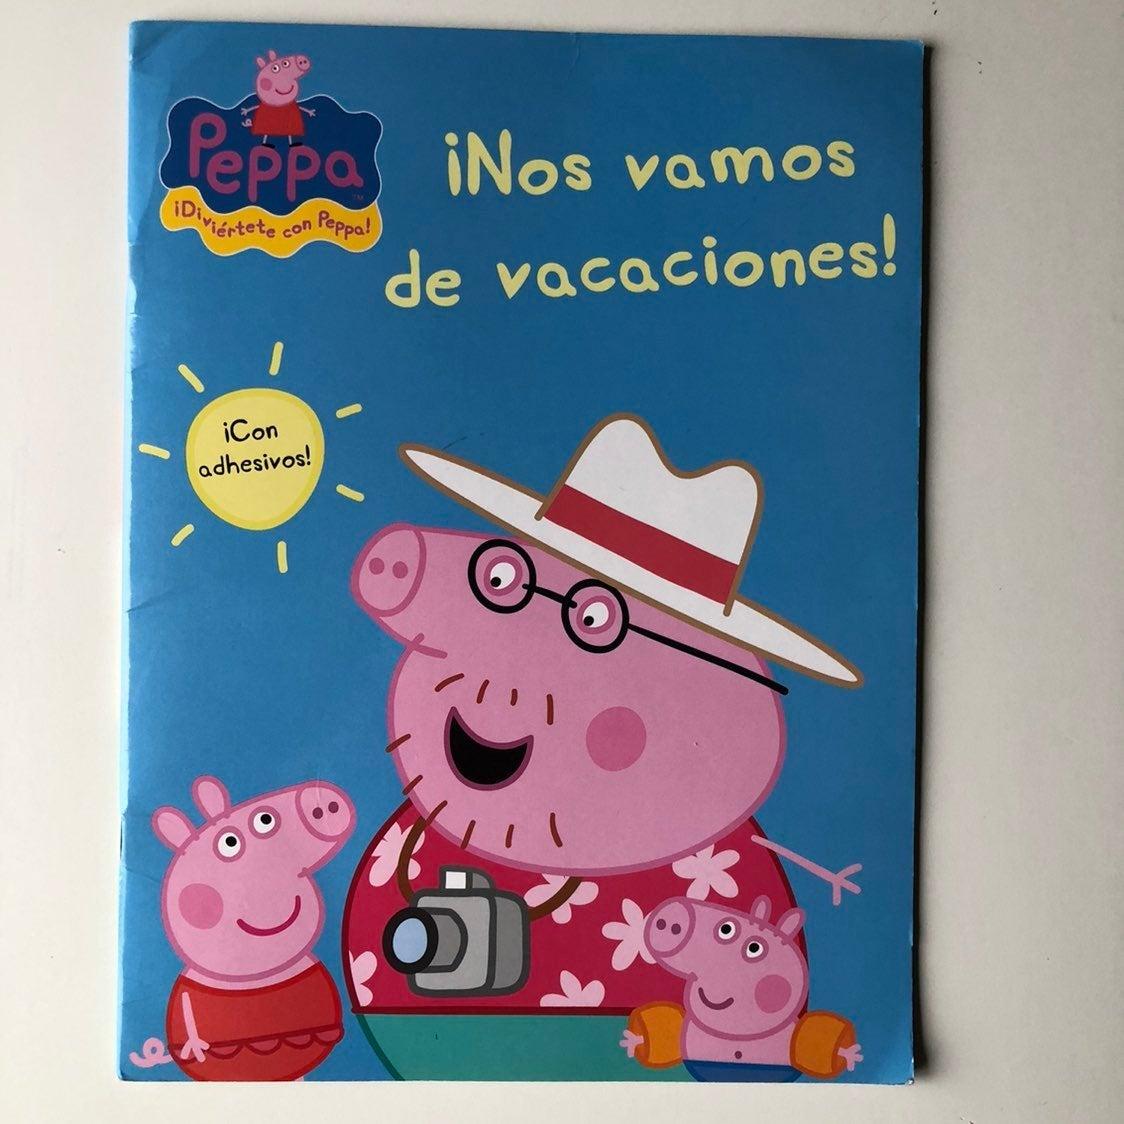 Peppa pig activity book in Spanish